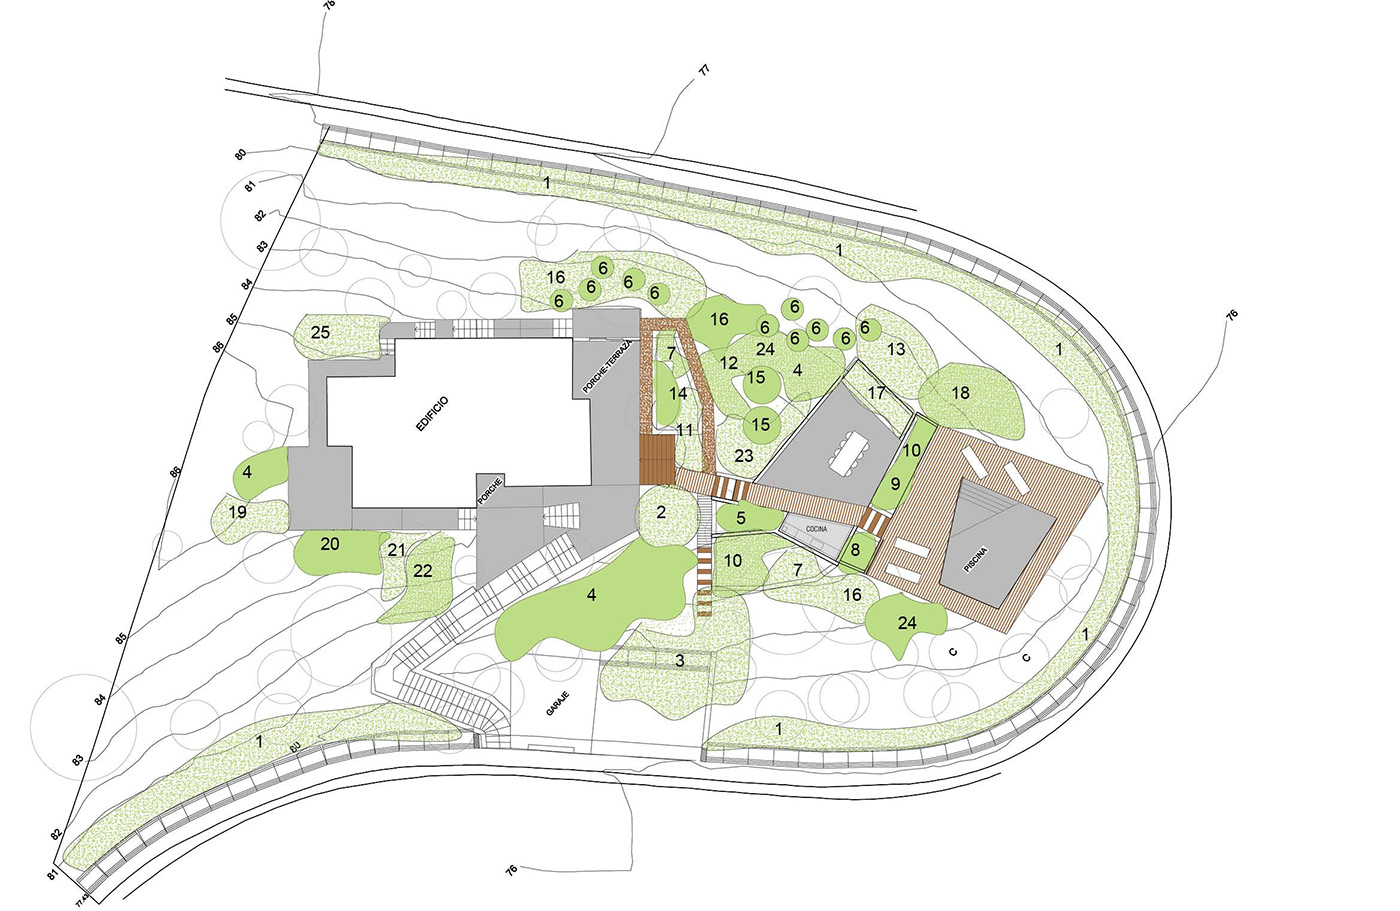 Tossa de Mar site plan